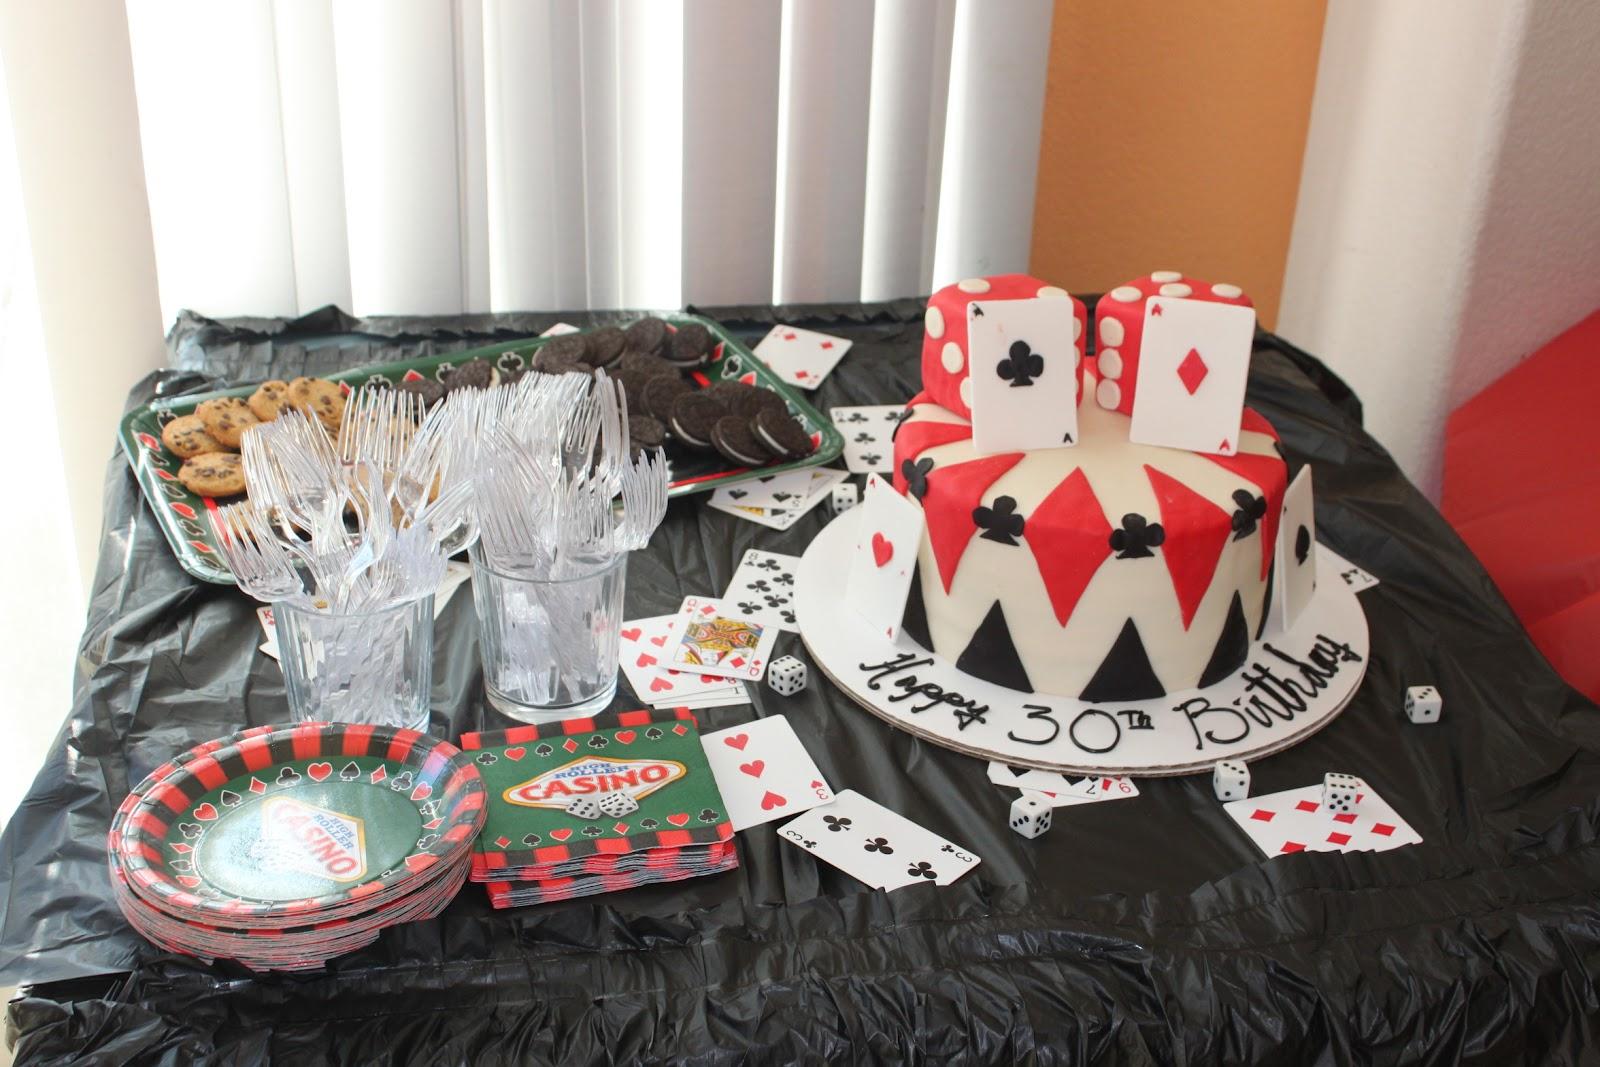 Party supplies casino night